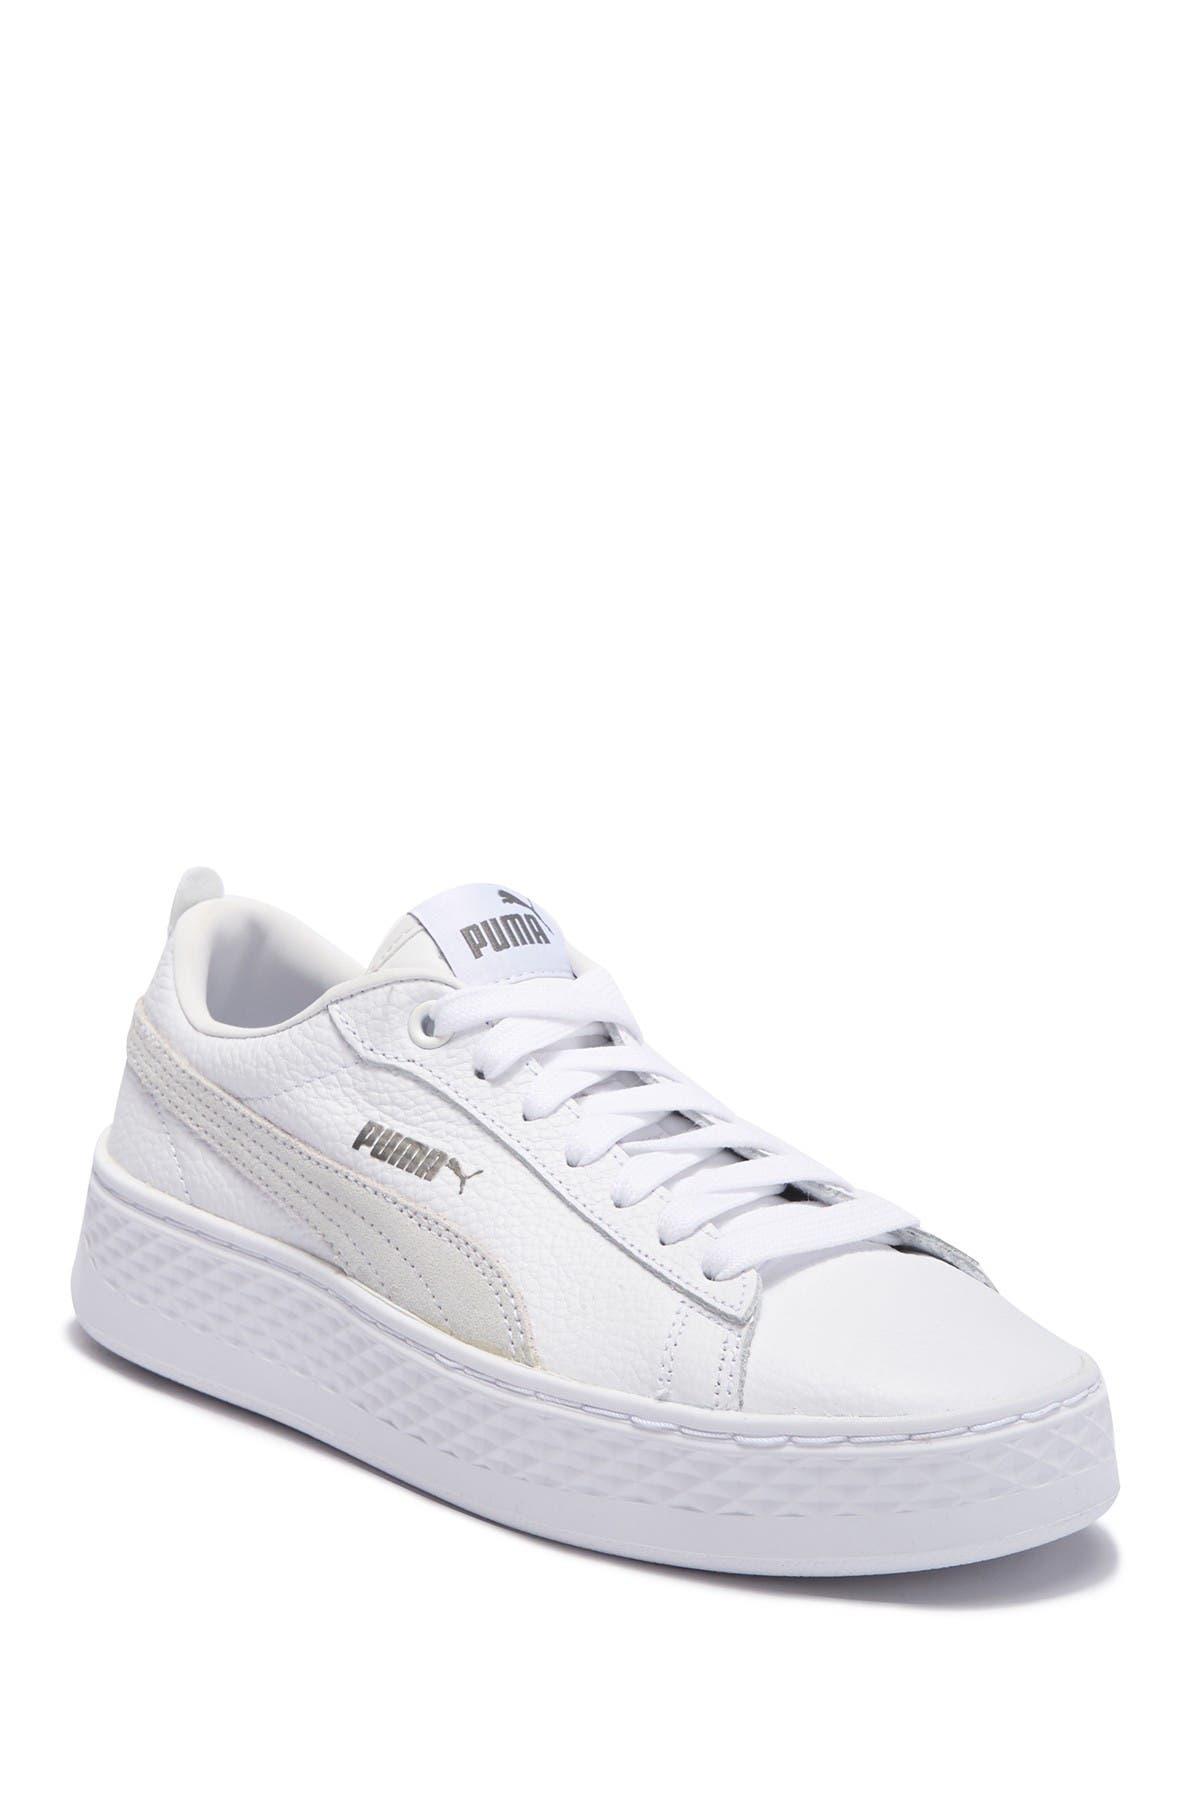 PUMA | Smash Leather Platform Sneaker